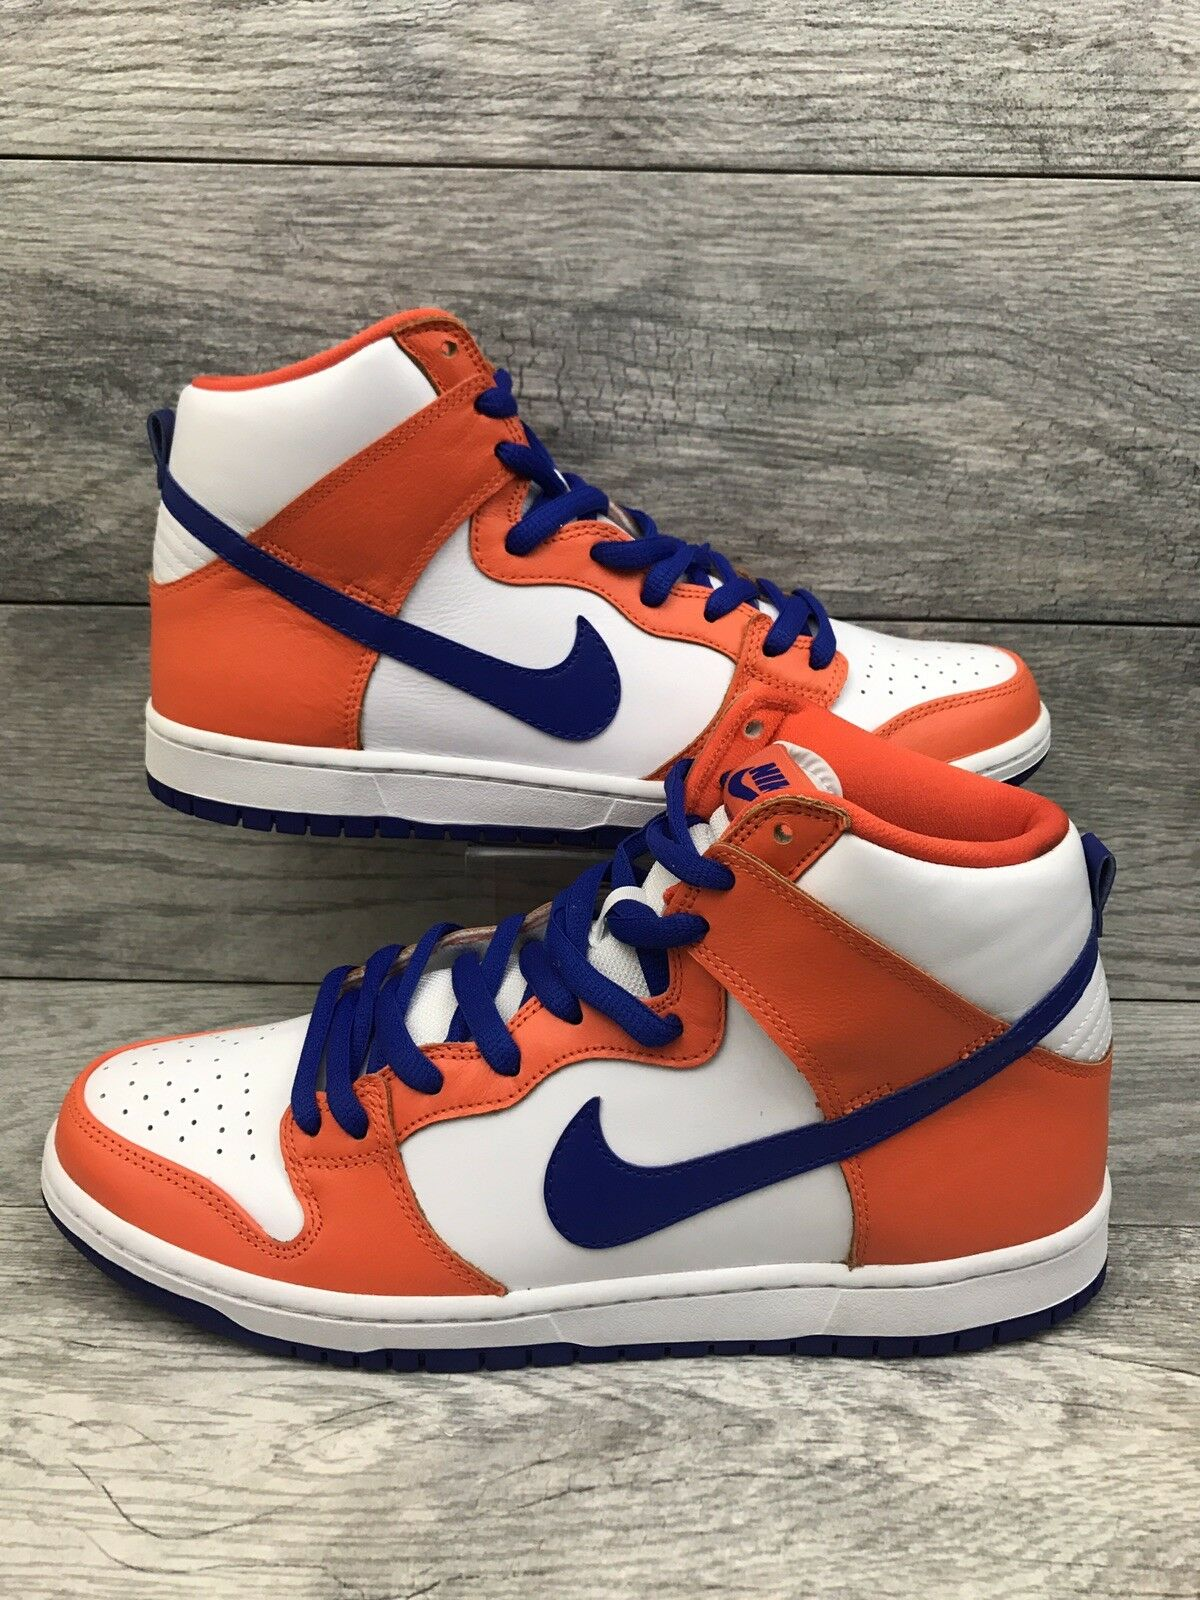 Nike SB Dunk High TRD QS Mens Size 11 orange White bluee Danny Supa AH0471-841